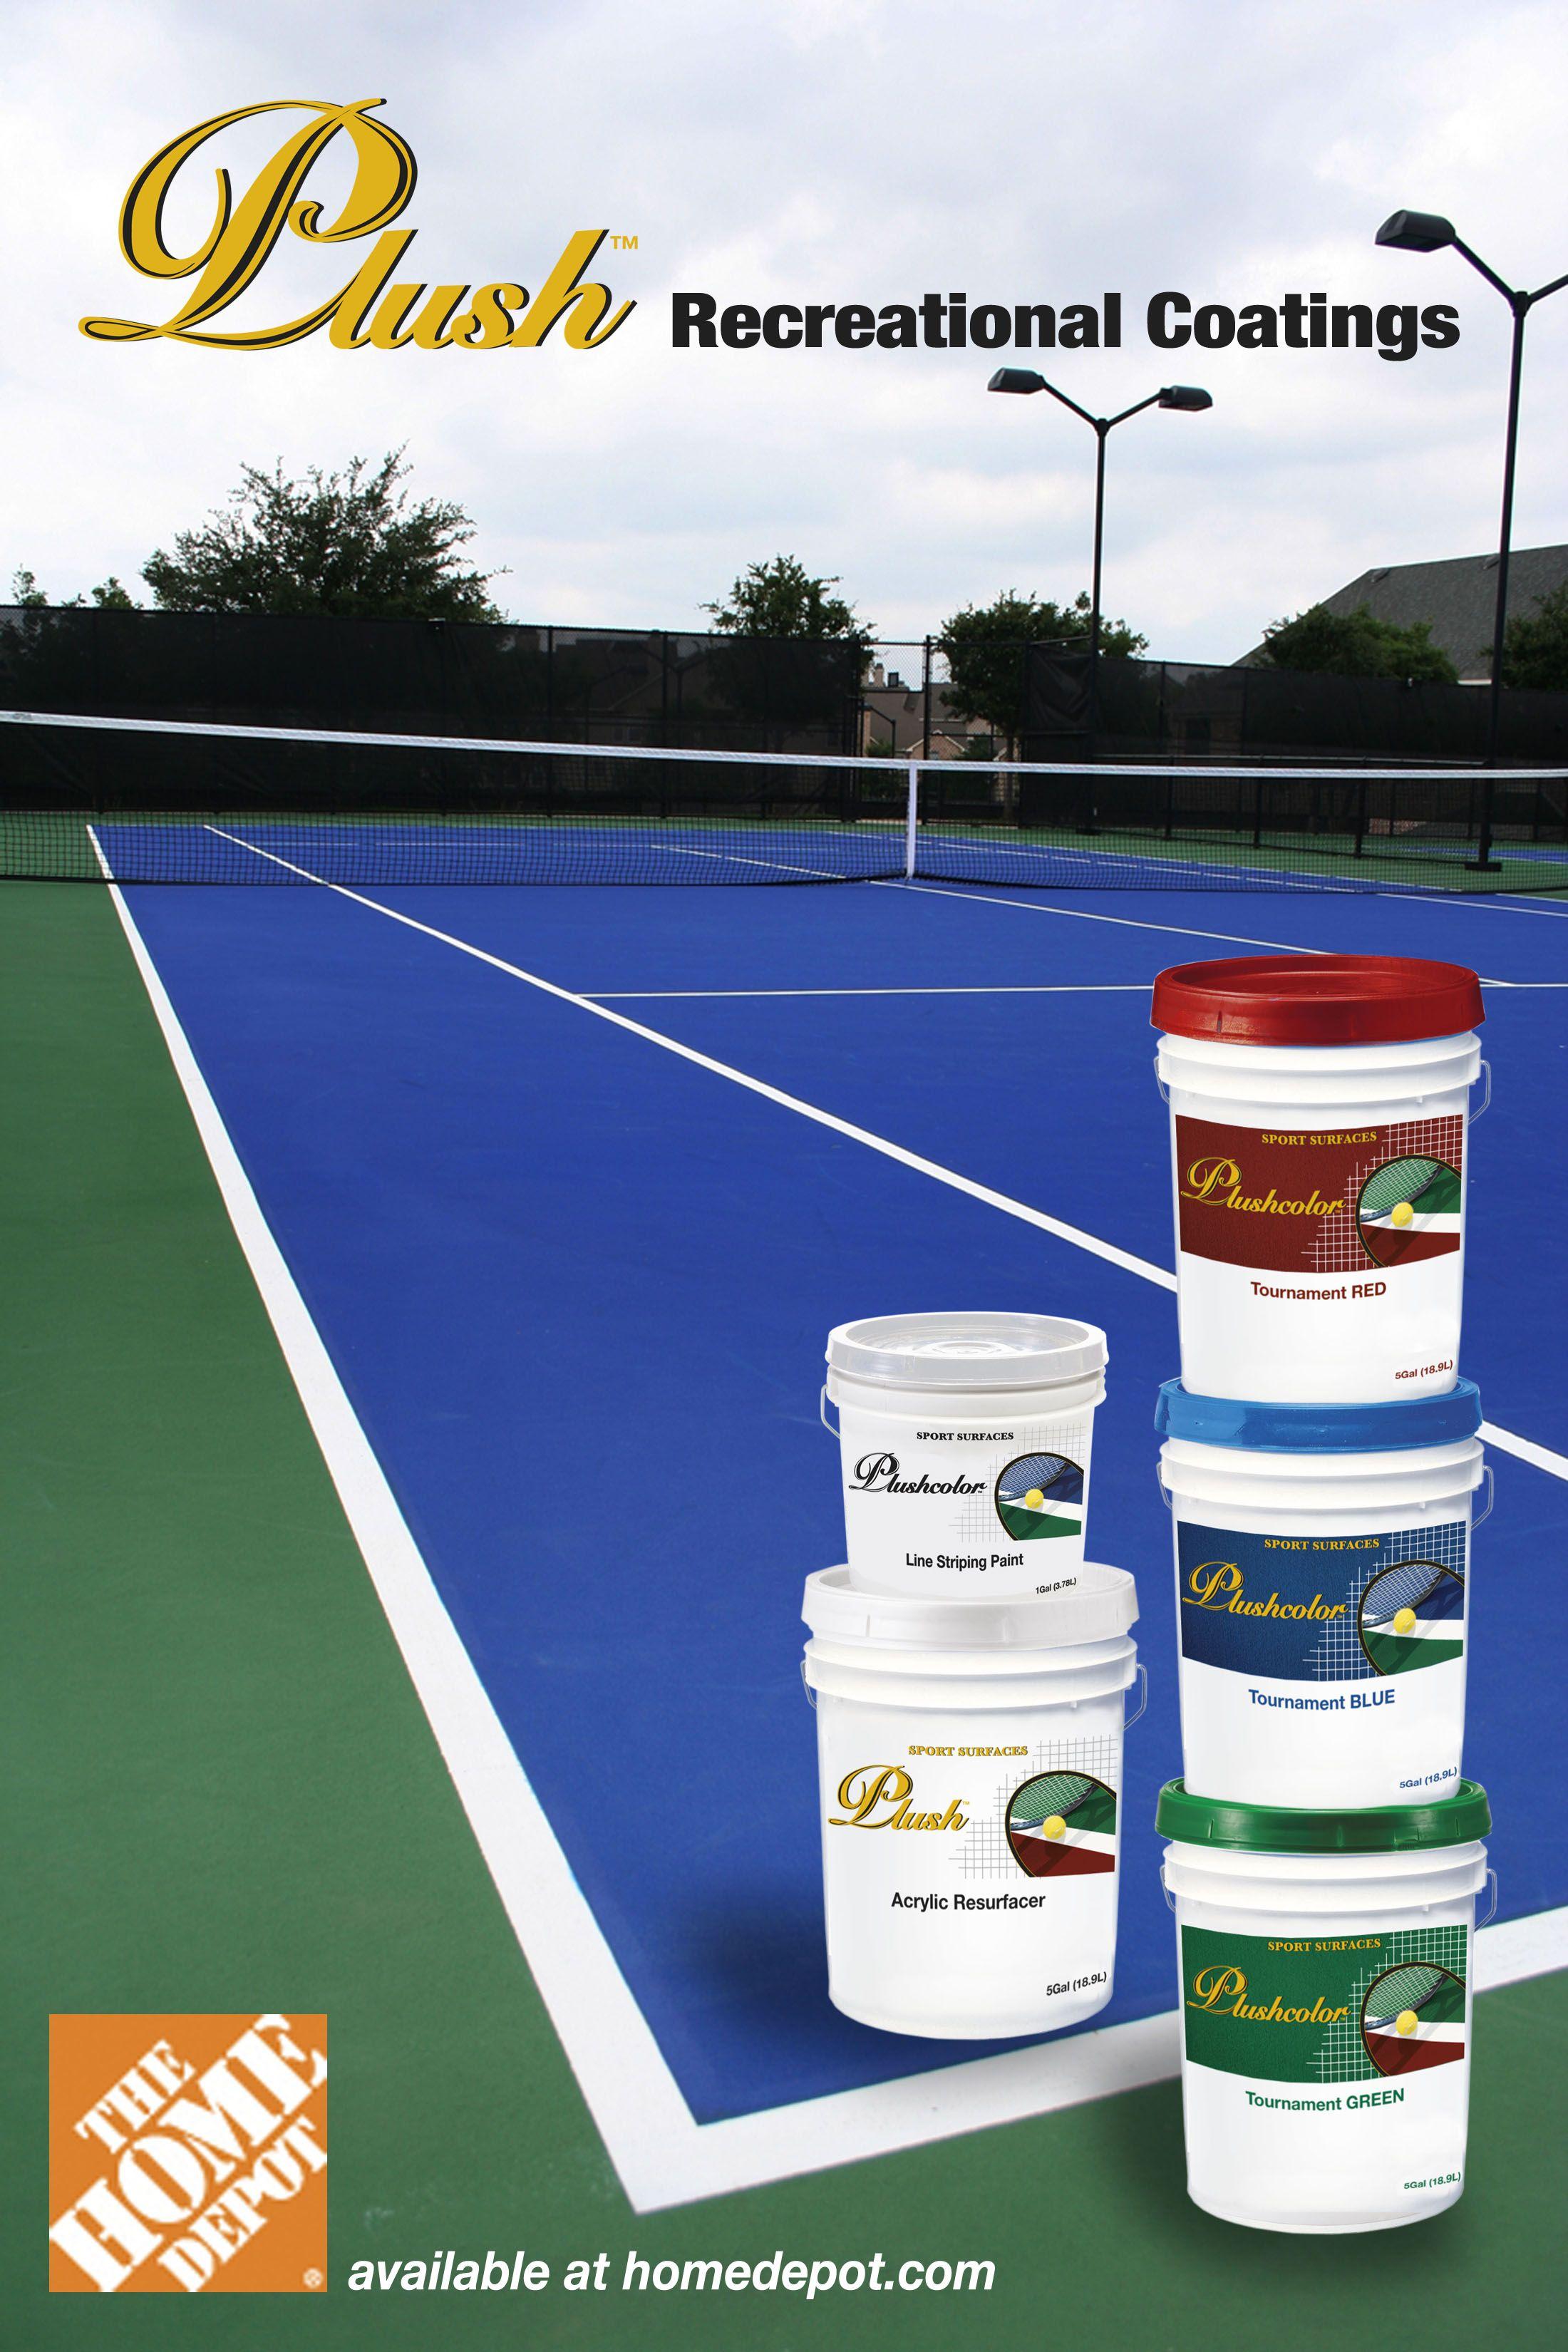 plush 5 gal tournament green recreational surface coating greens